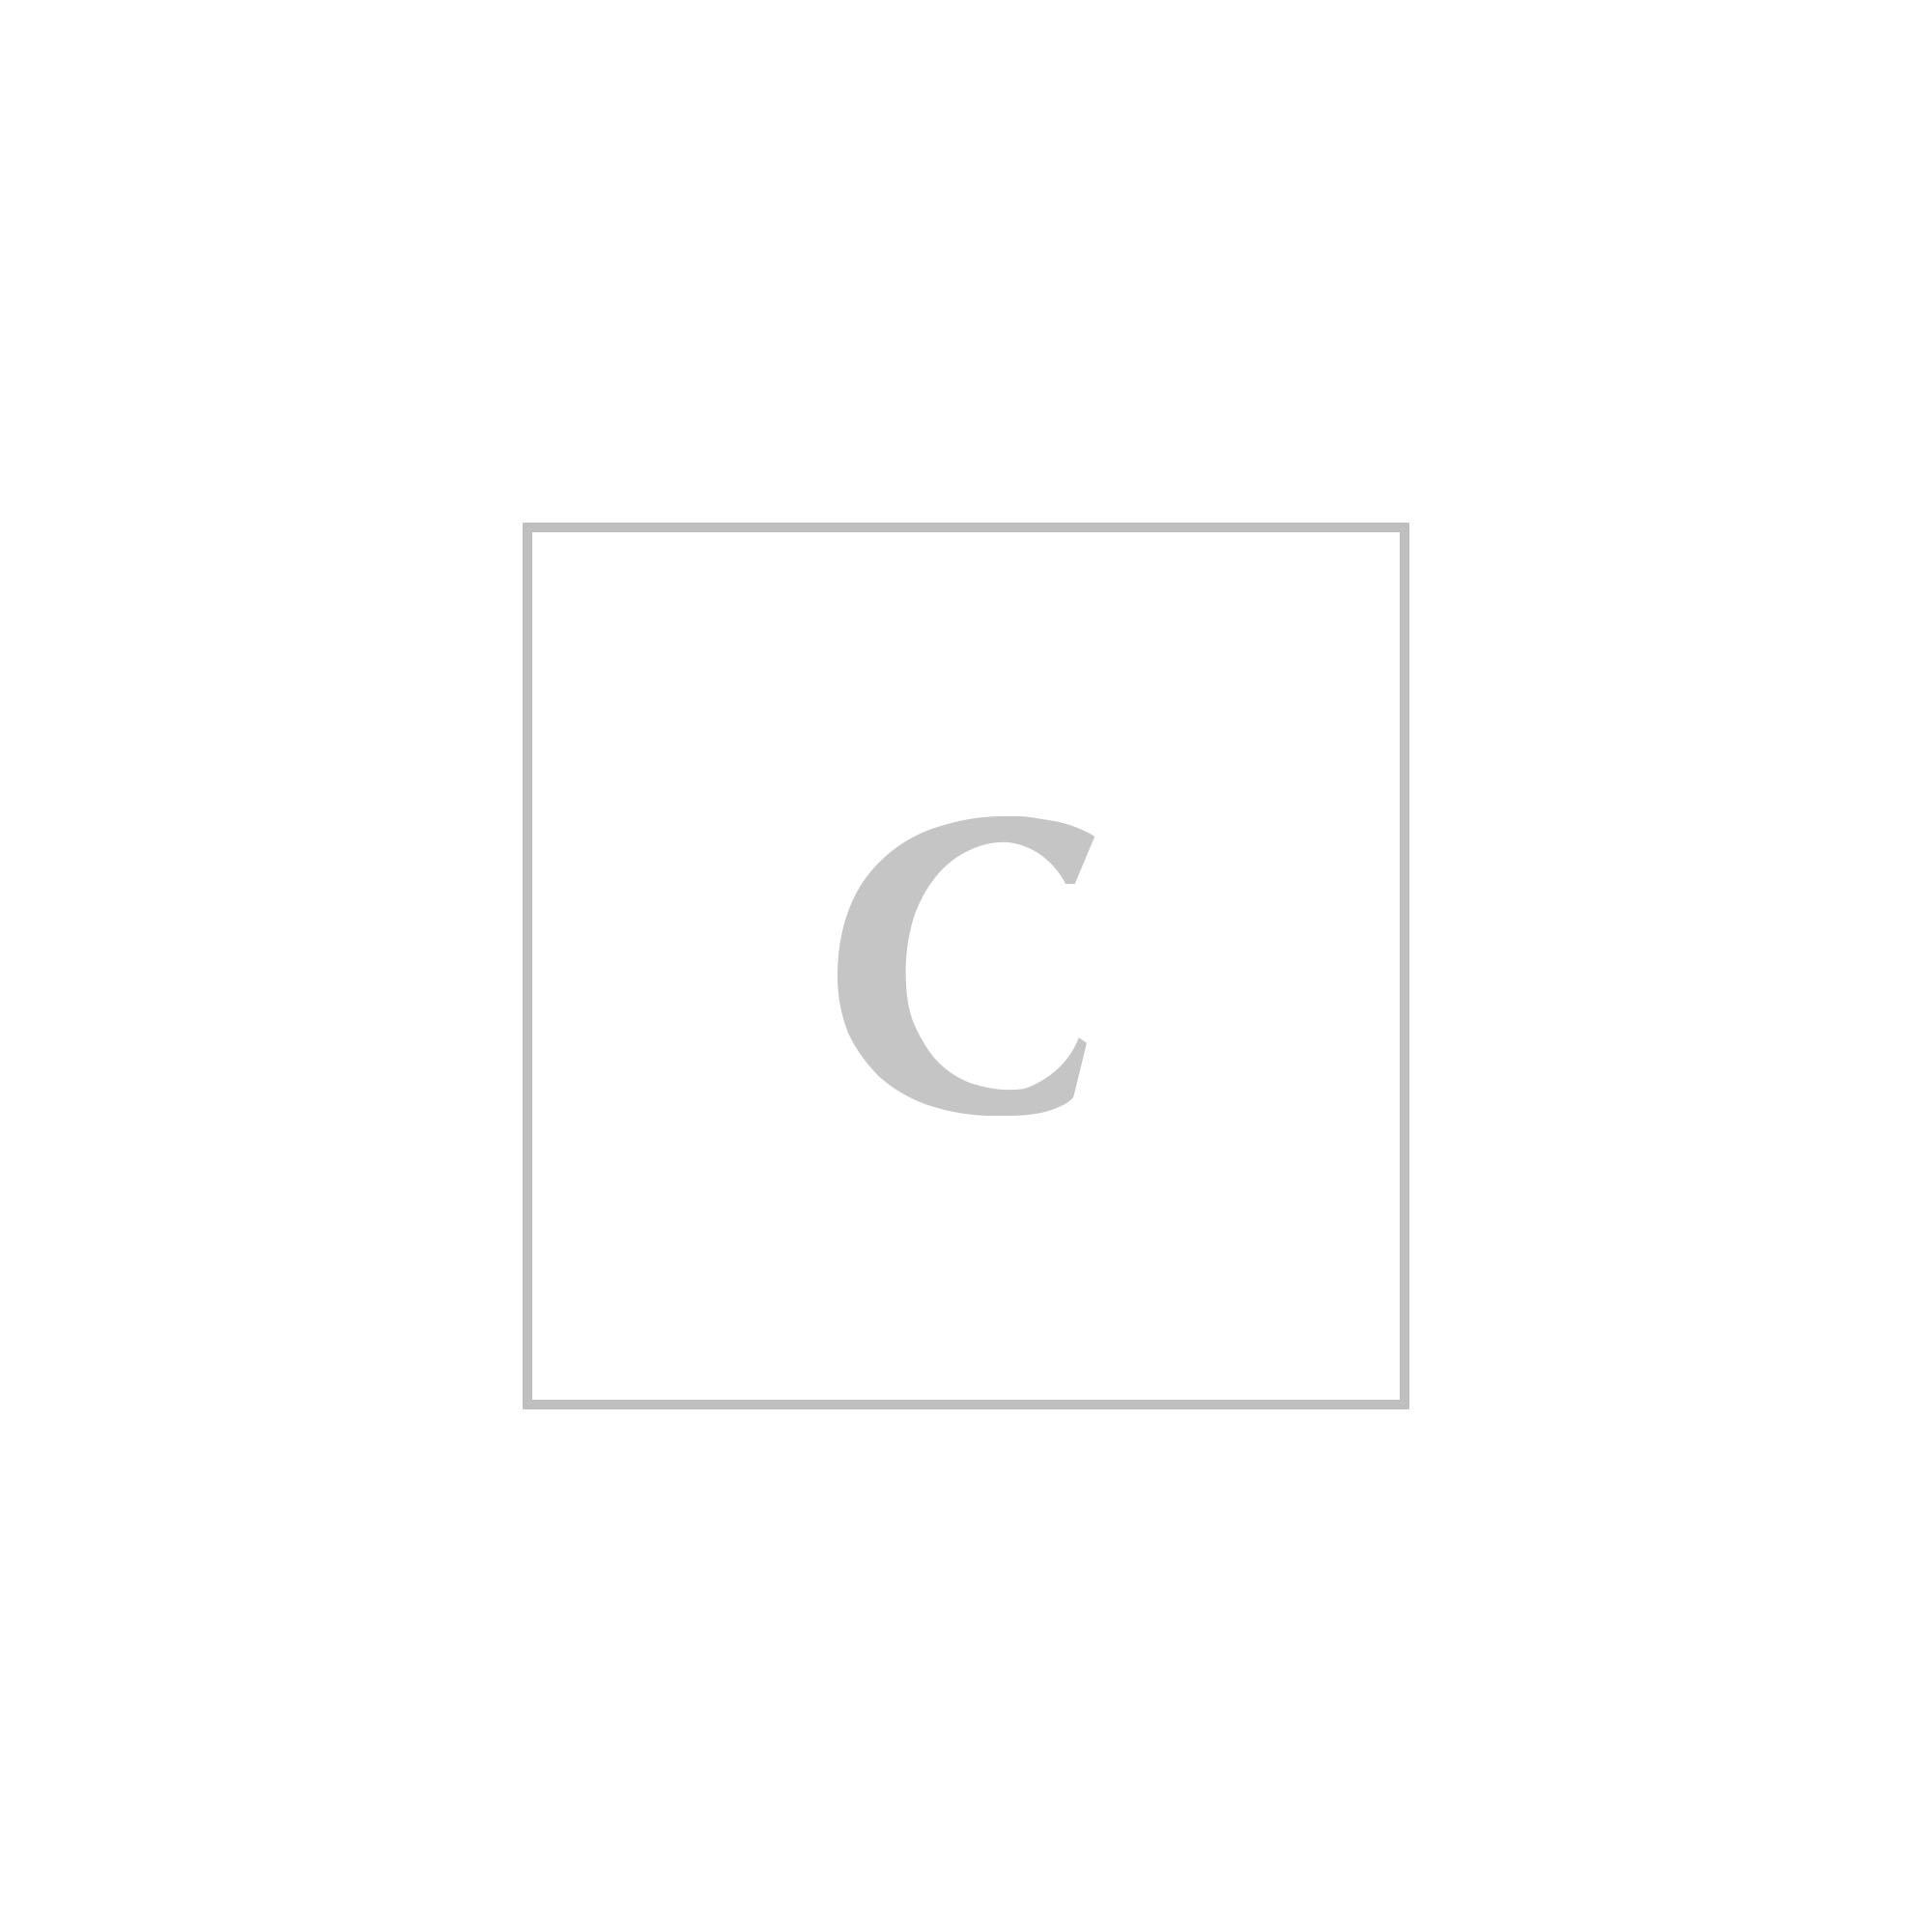 Saint laurent ysl pochette monogram